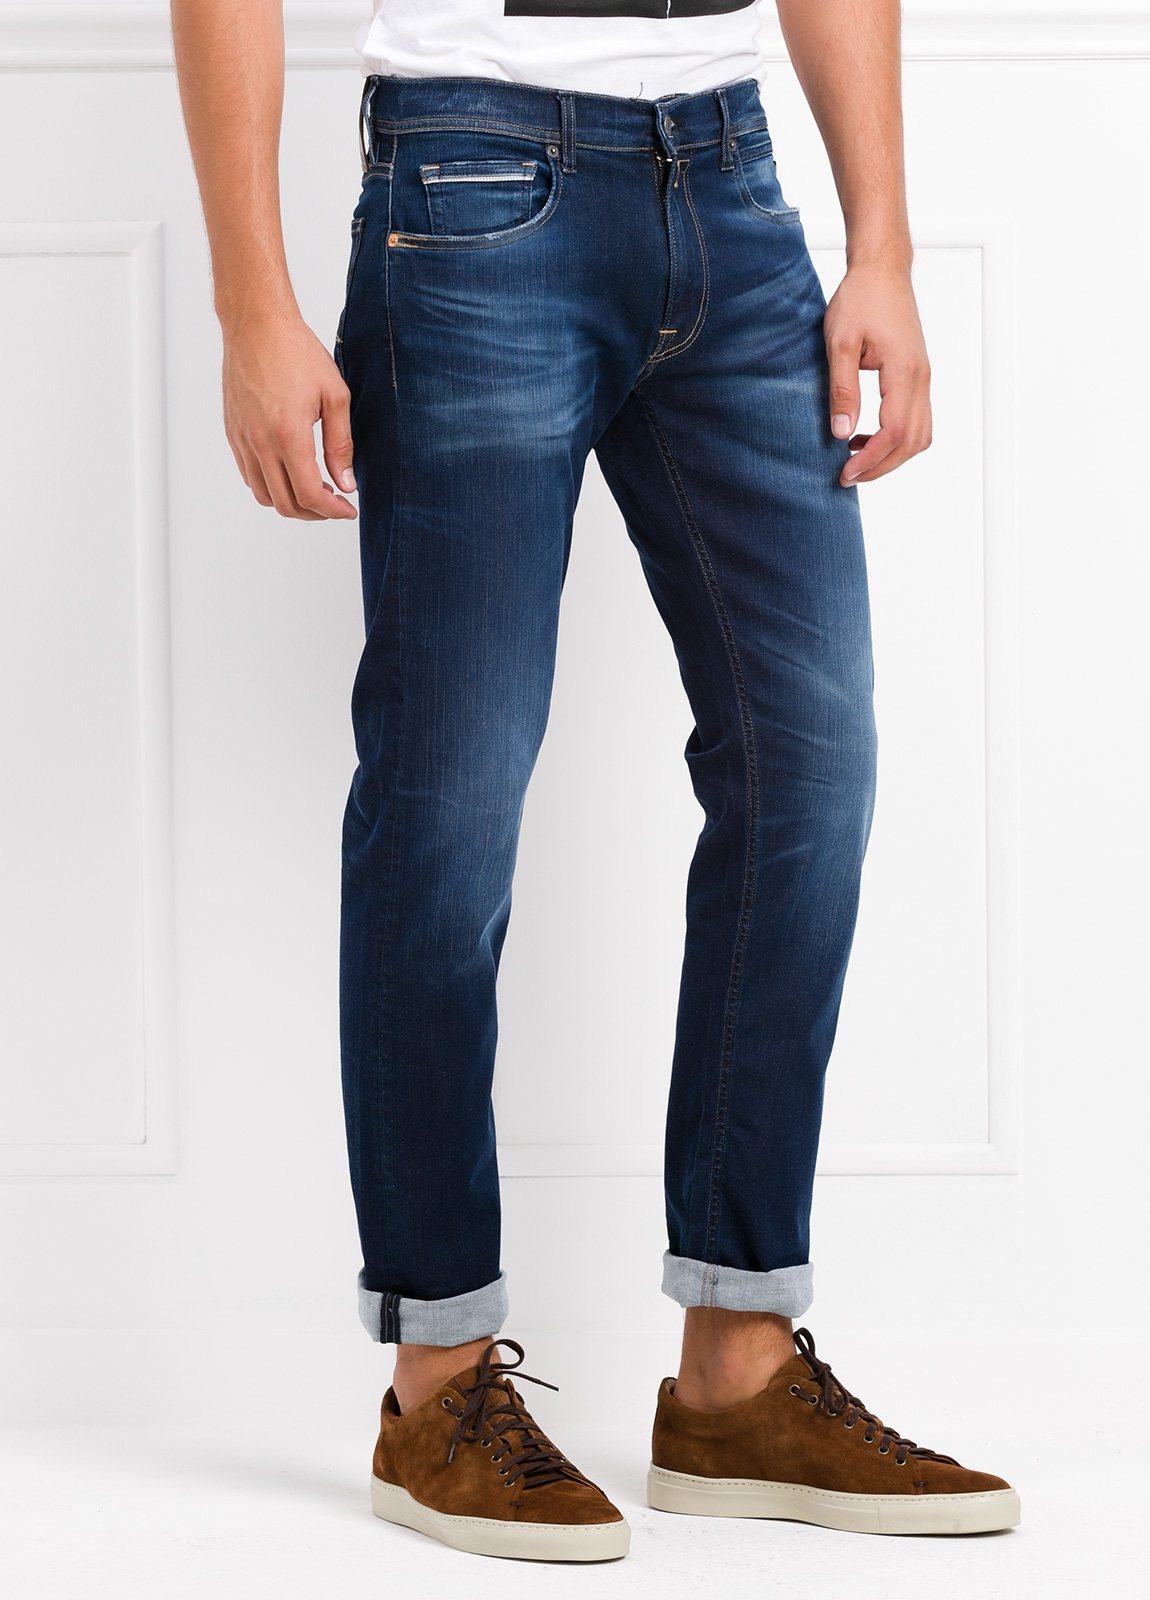 Pantalón tejano corte recto MA972 GROVER color azul lavado. Algodón - Ítem1